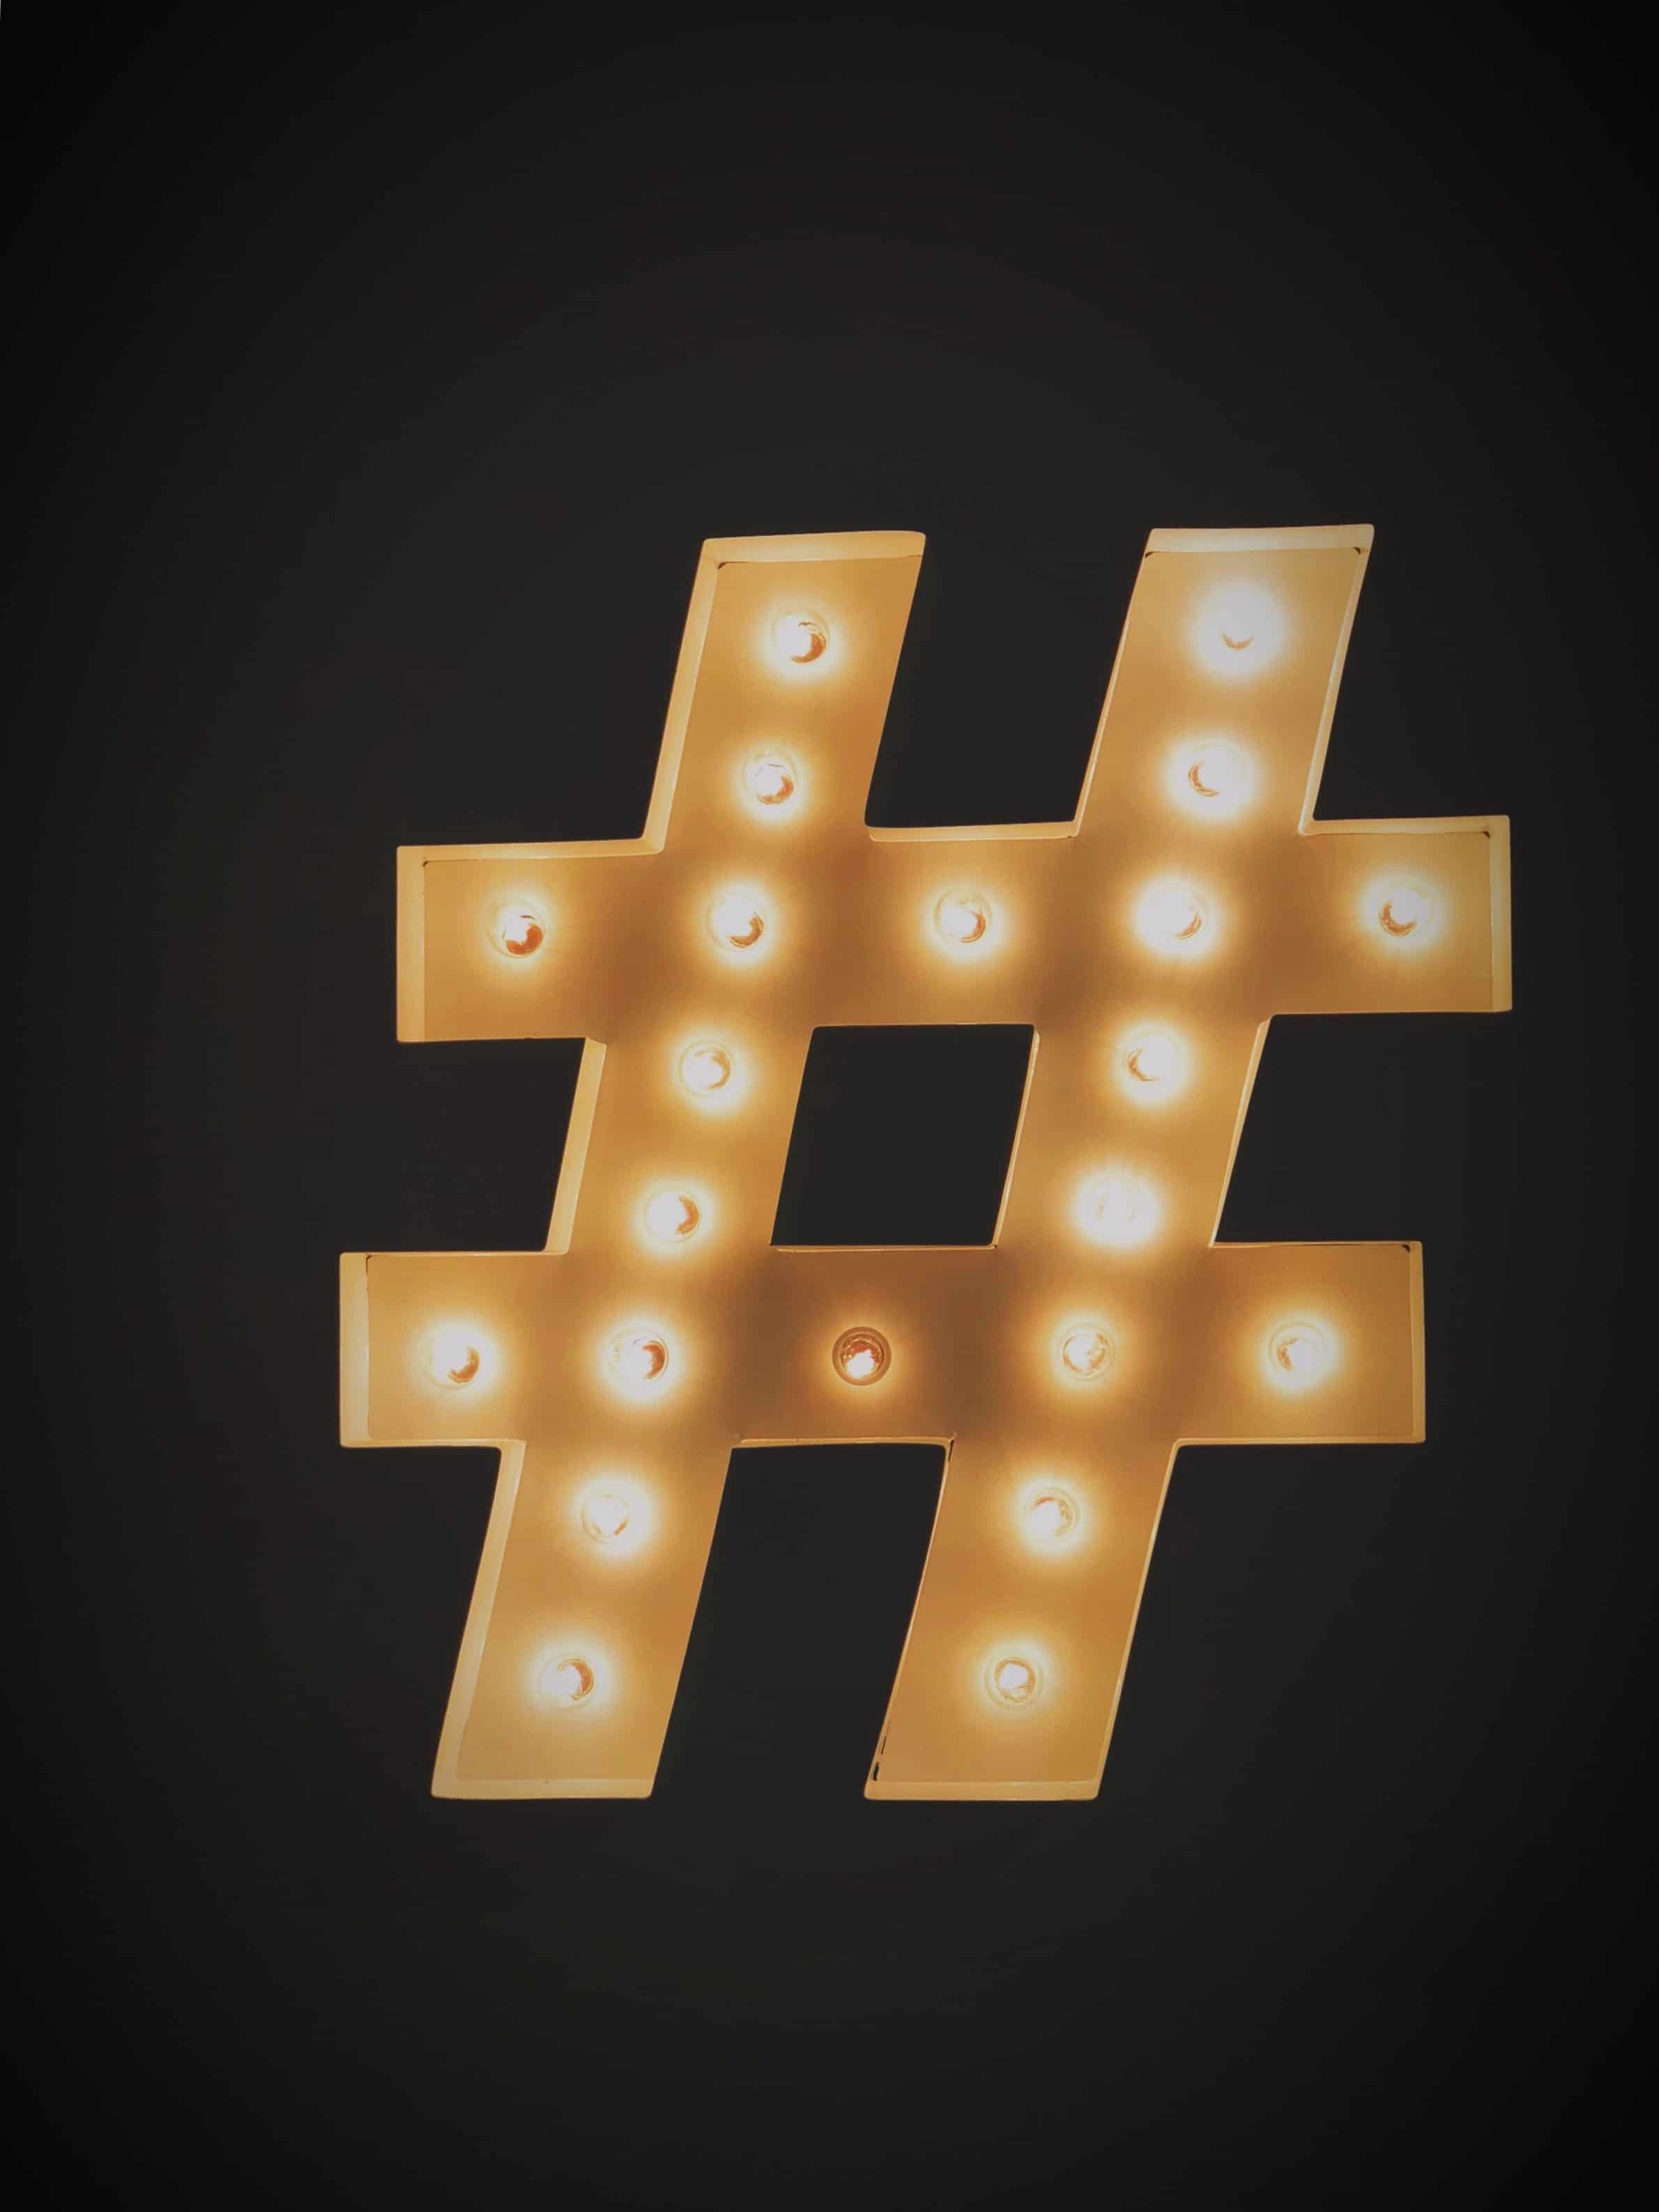 hashtag-sign